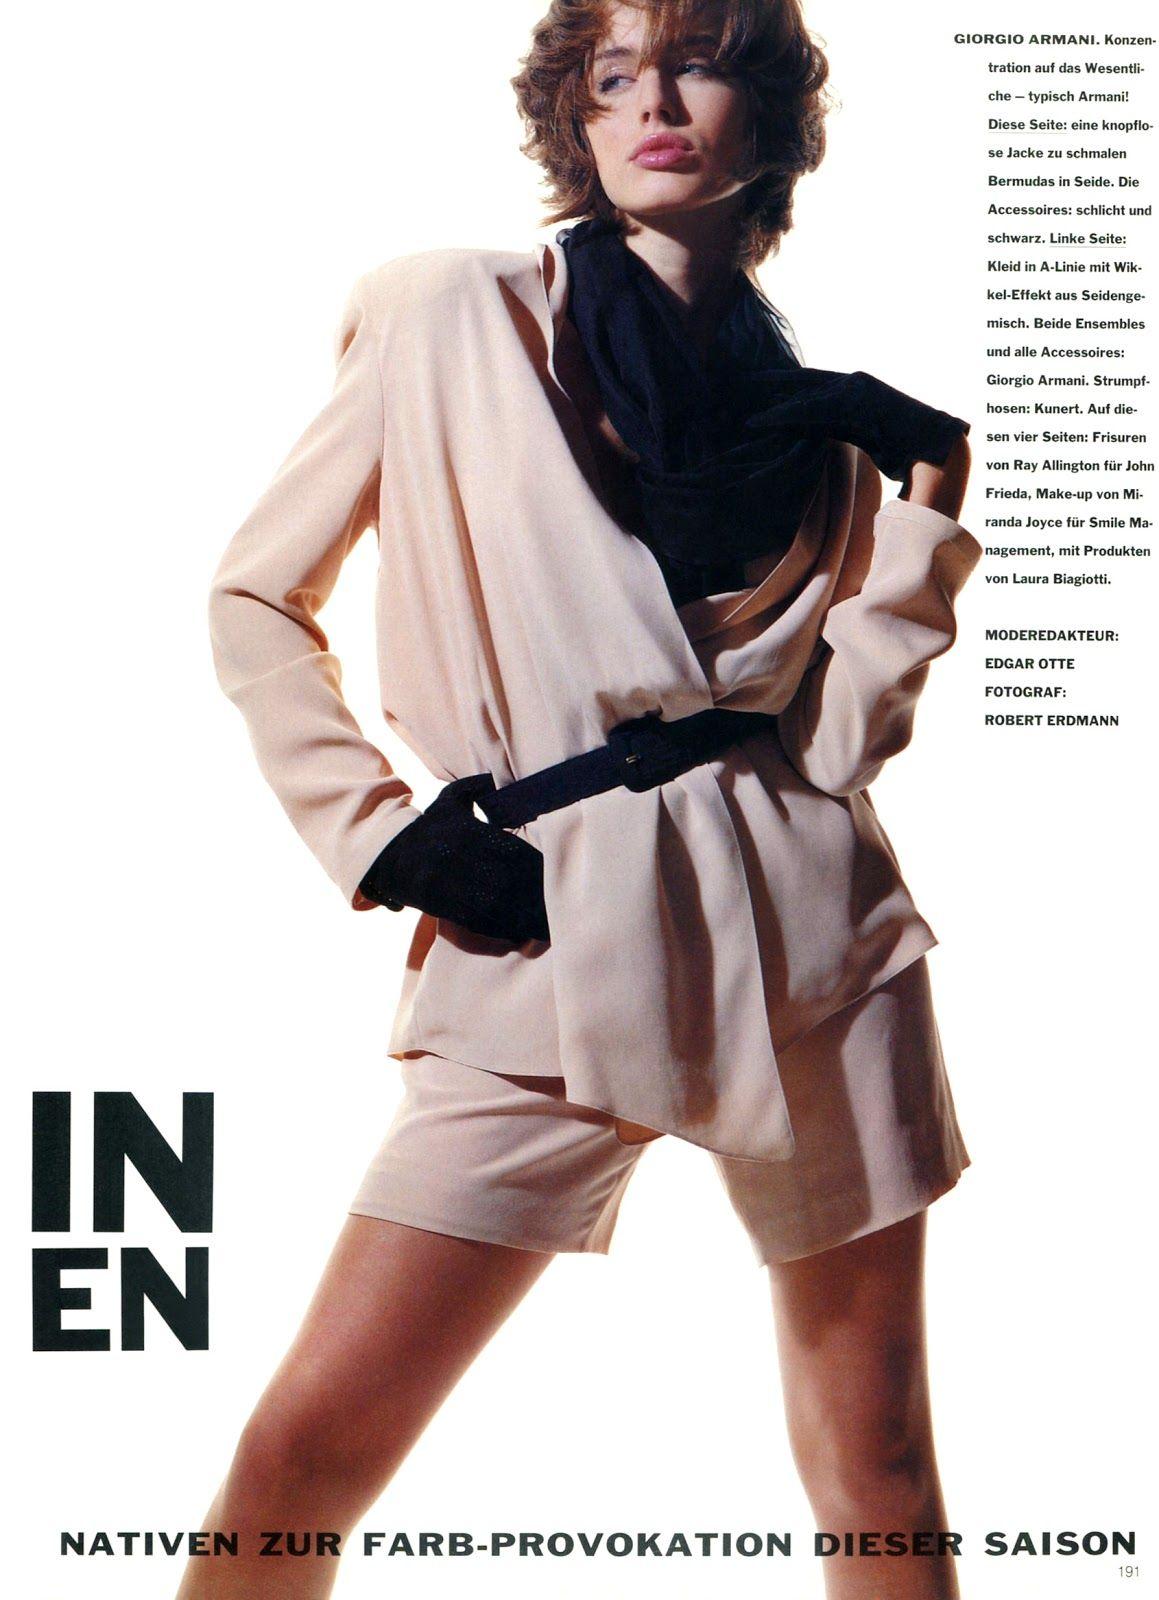 Vogue (Germany) January 1991 | Multi Color 14.jpg